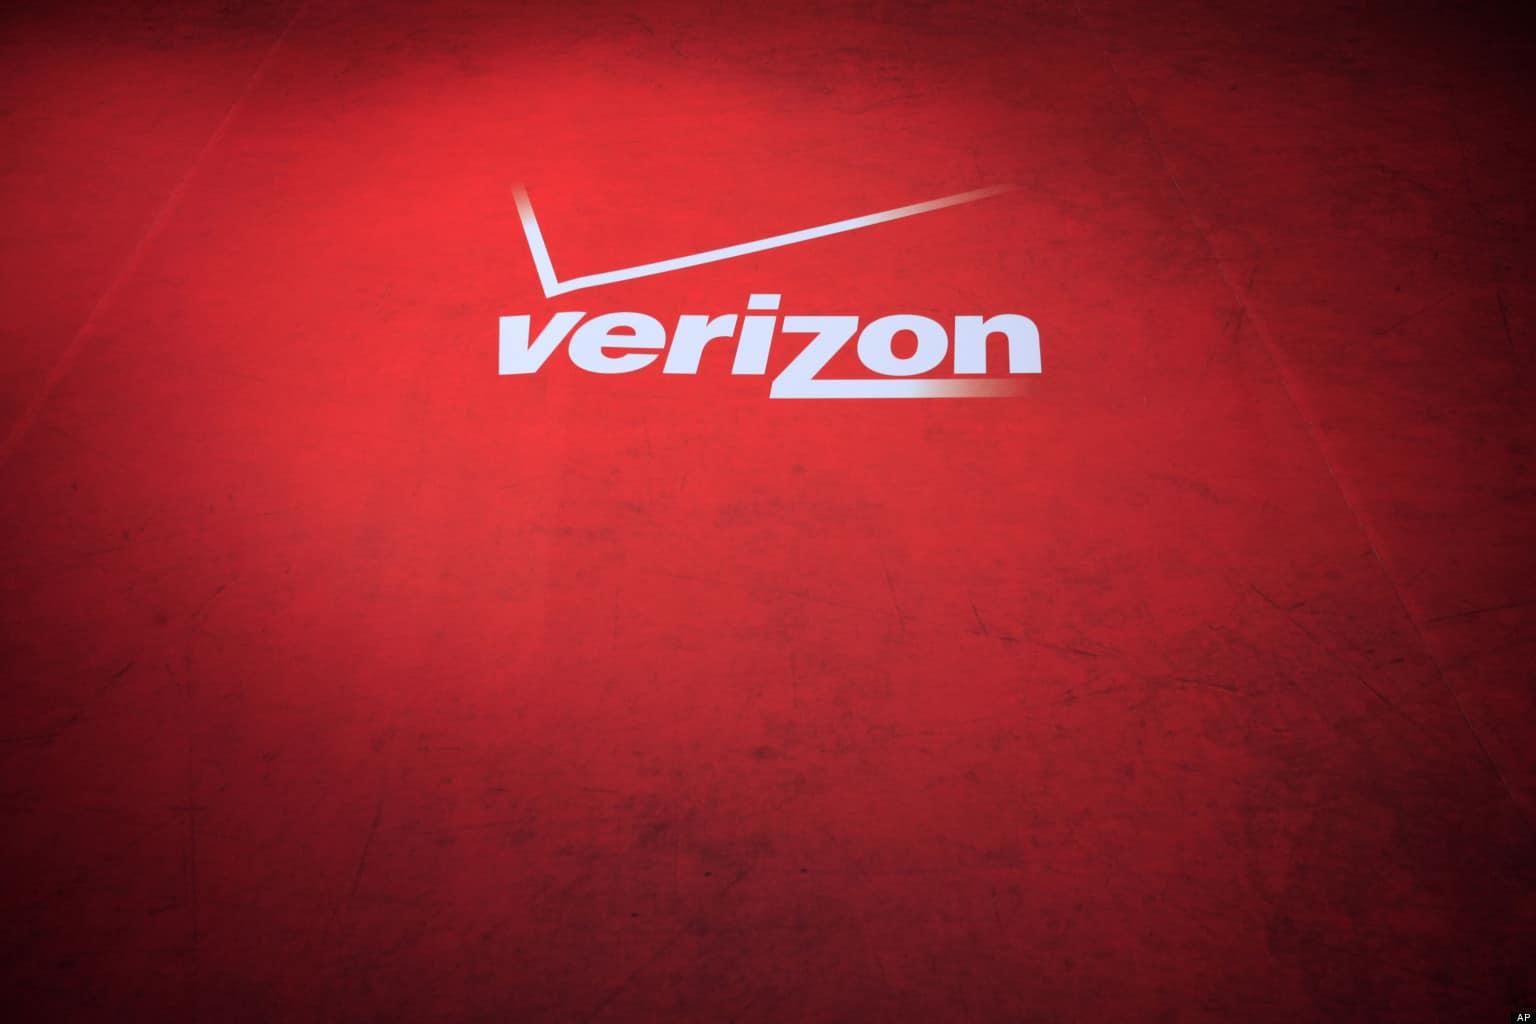 Verizon FiOS Chat Support Sucks - The Geek Pub